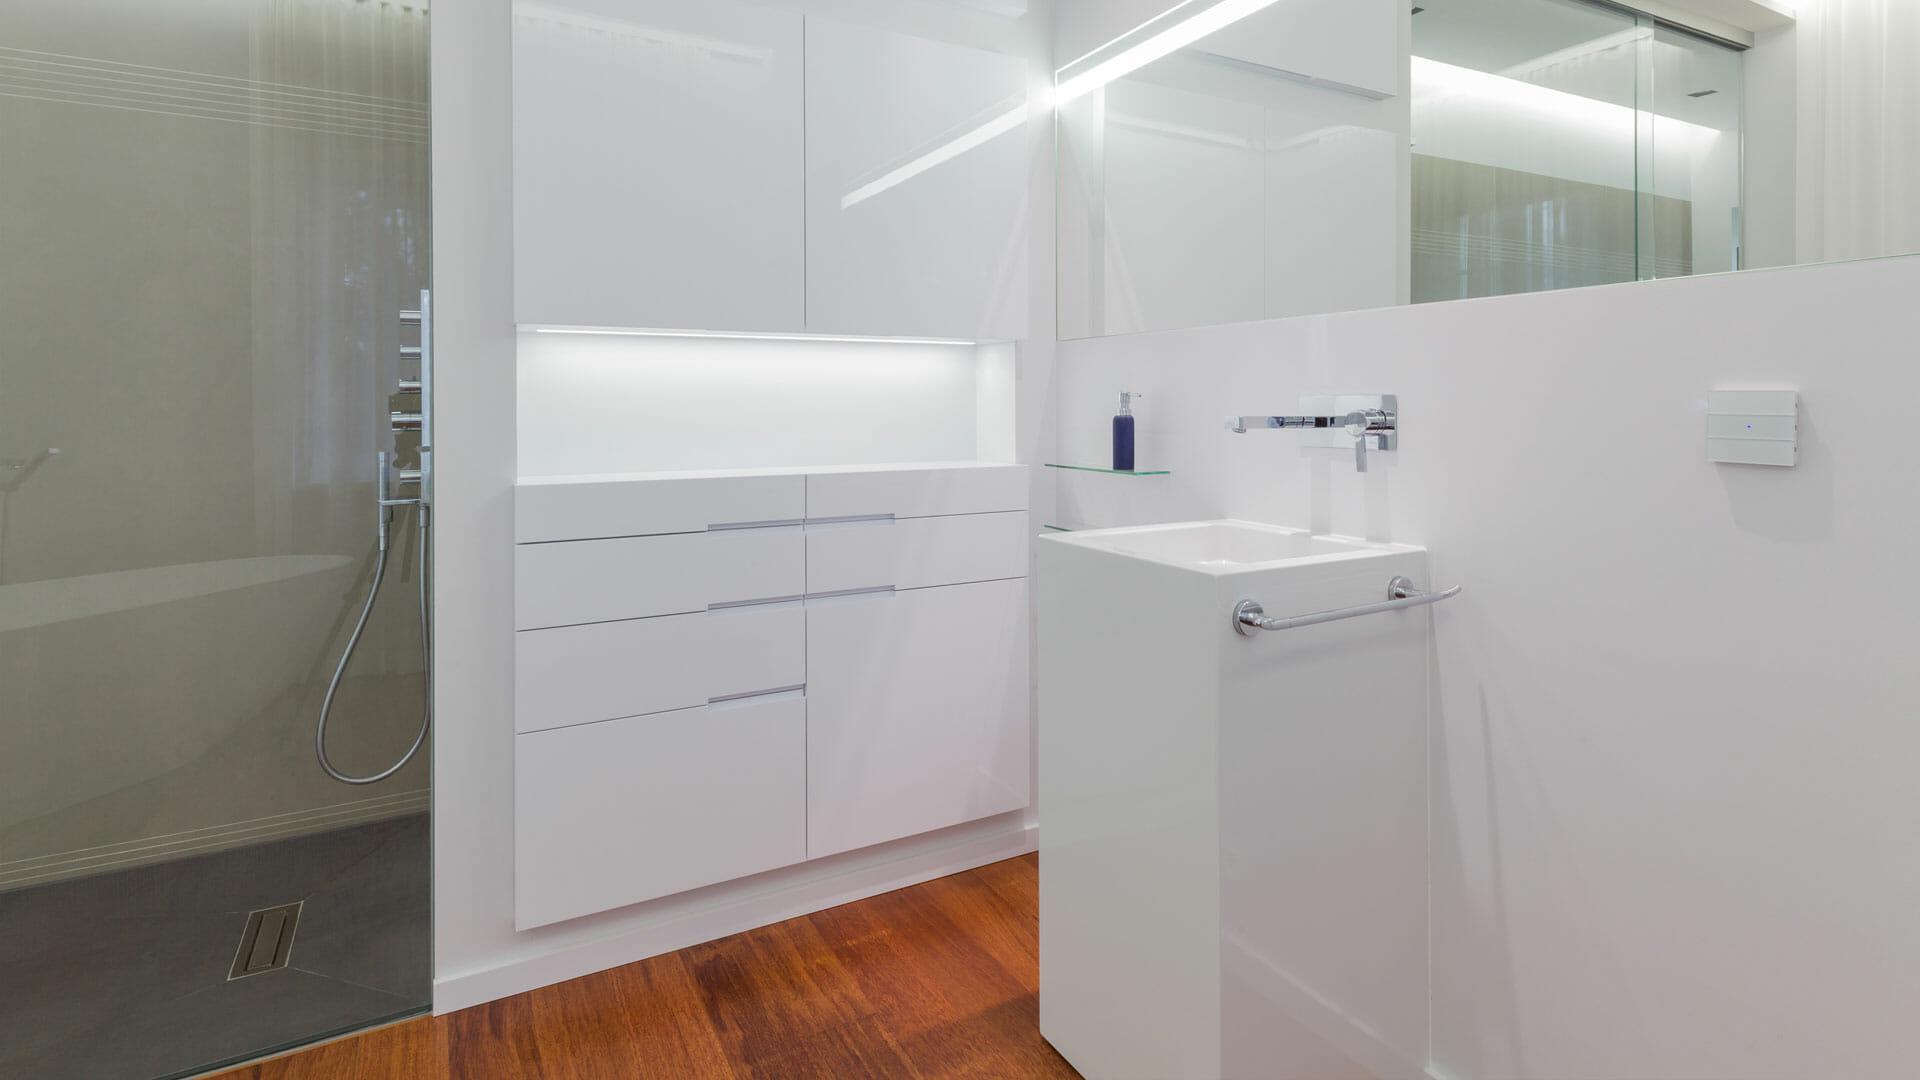 helles offenes badezimmer design diemeistertischler. Black Bedroom Furniture Sets. Home Design Ideas